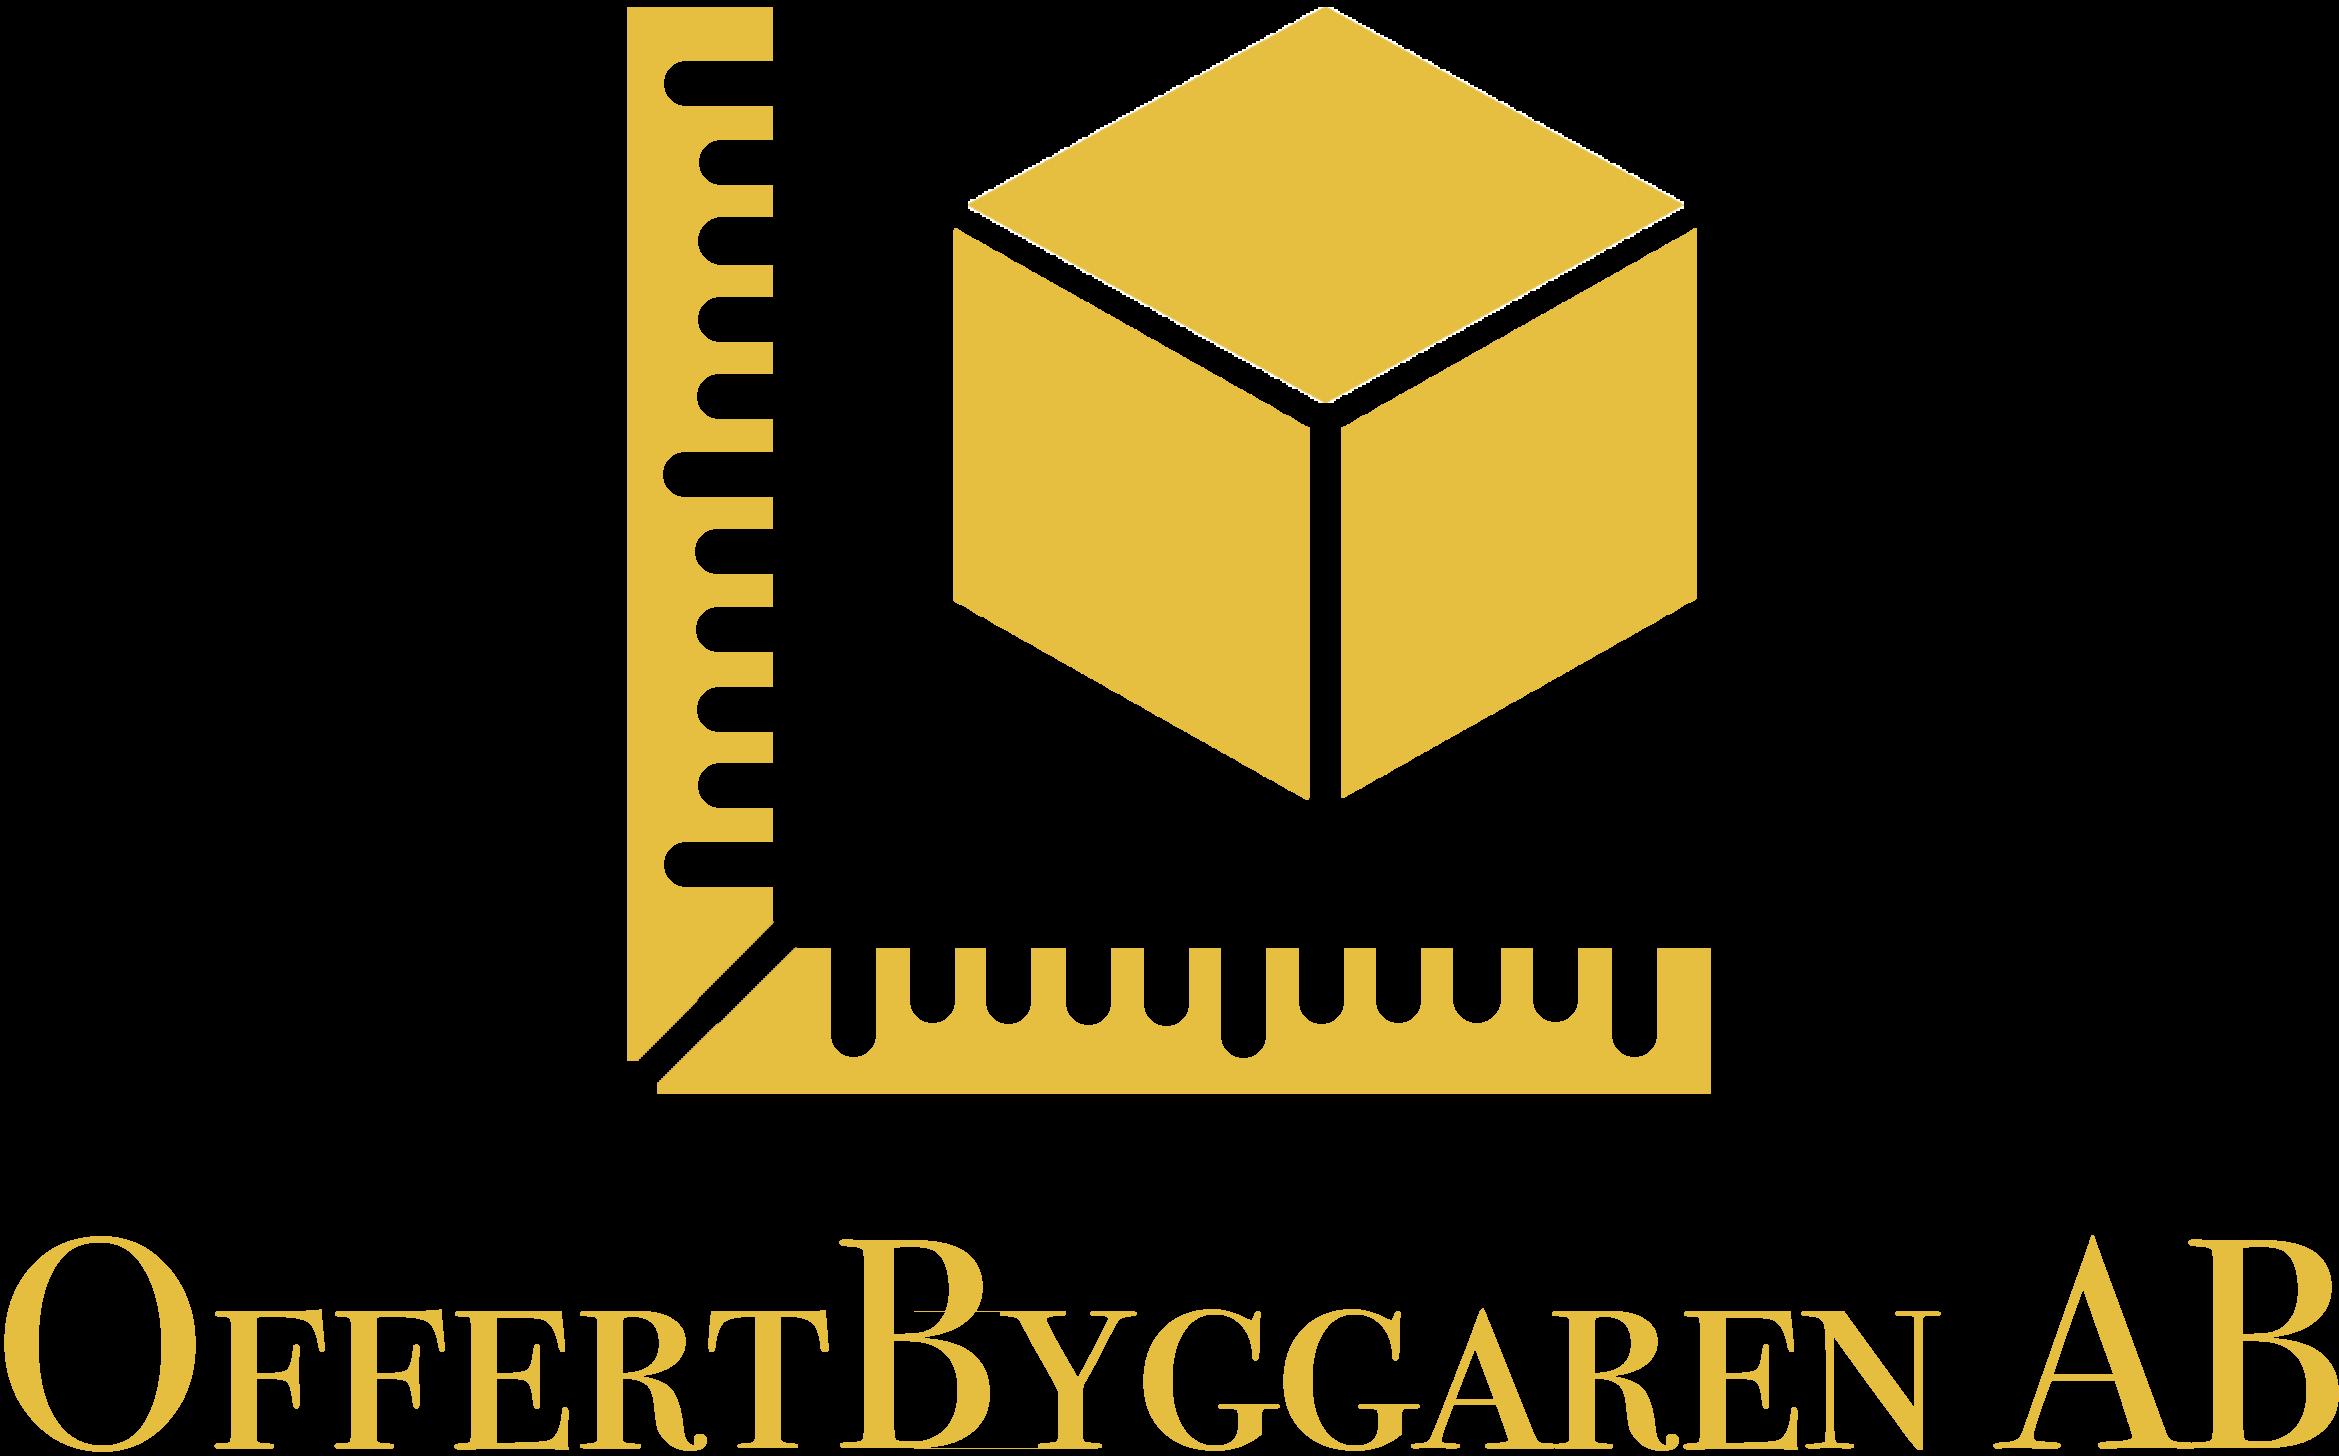 OffertByggaren AB